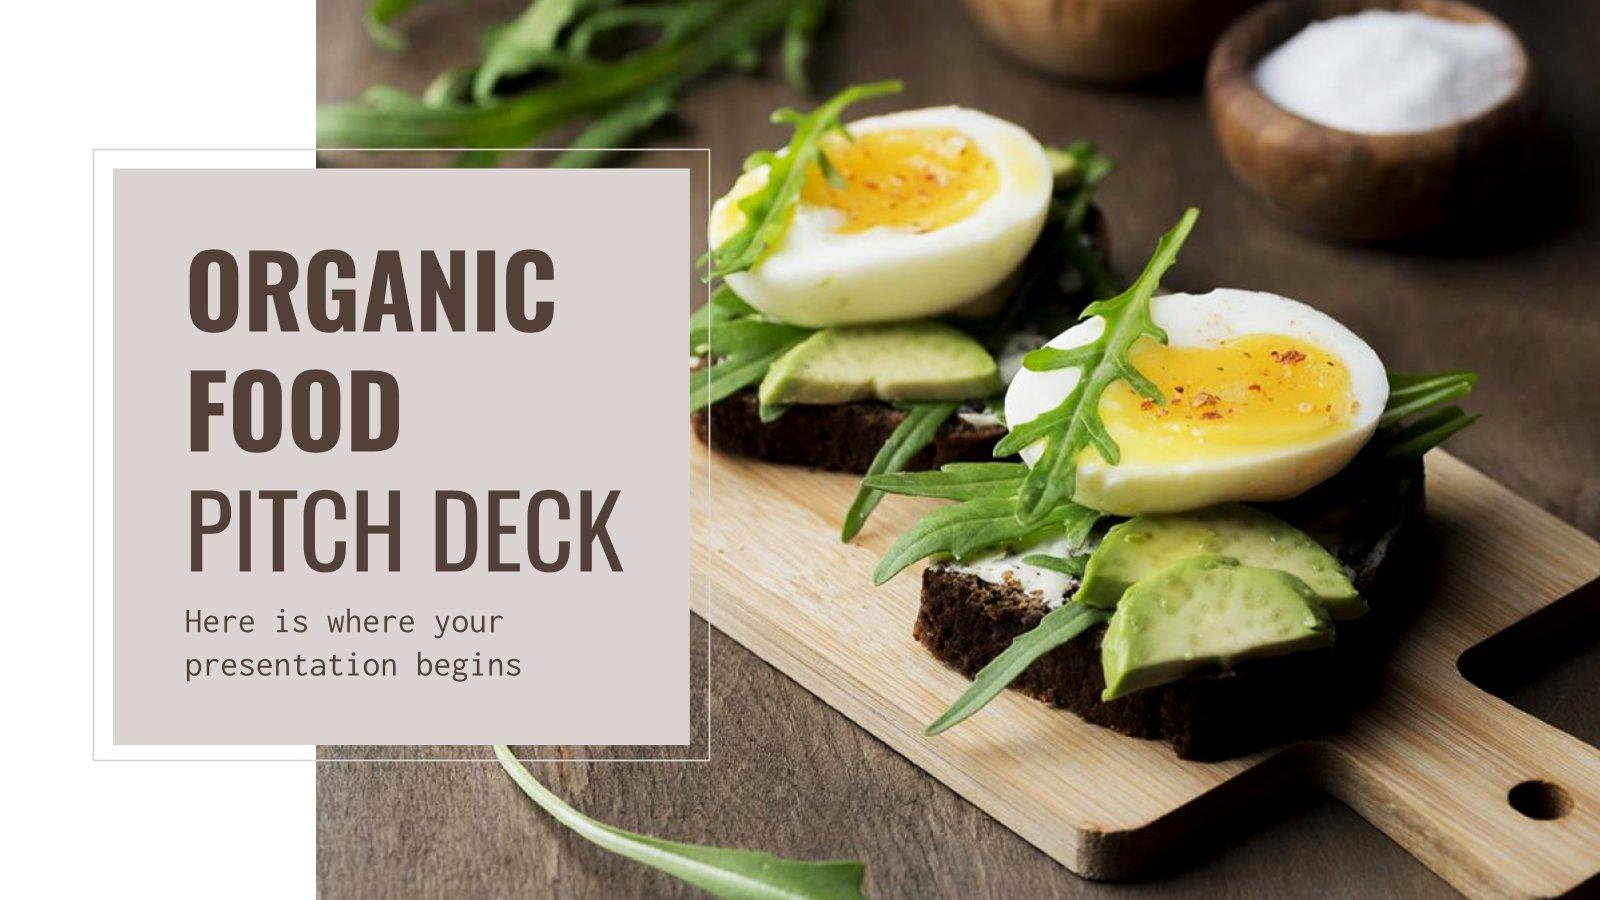 Plantilla de presentación Pitch deck para comida orgánica